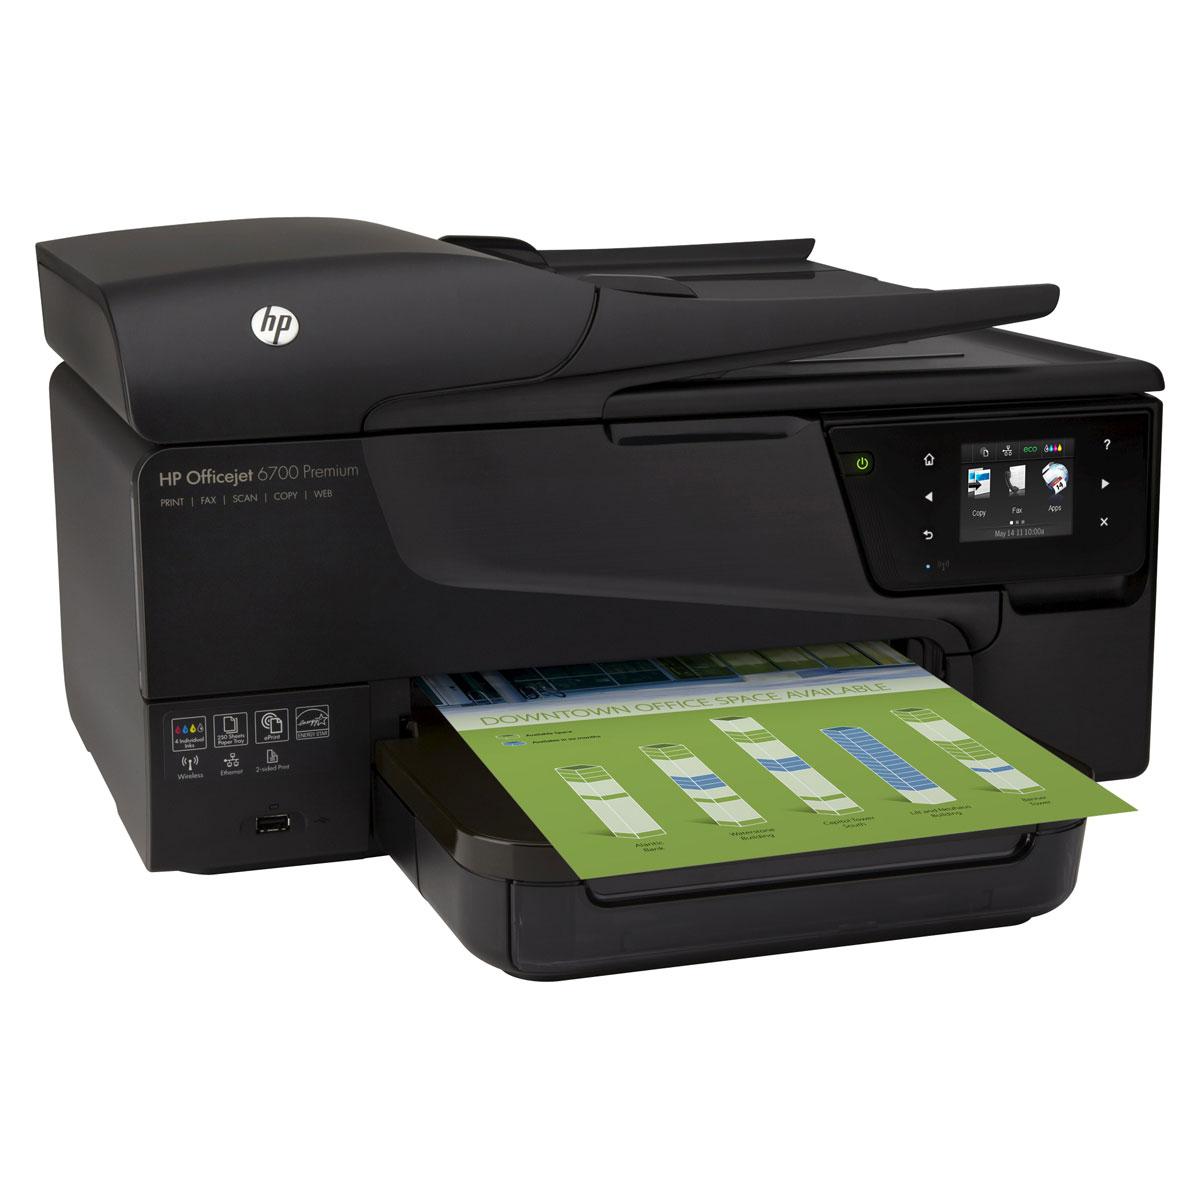 Hp Officejet 6700 Premium Imprimante Multifonction Hp